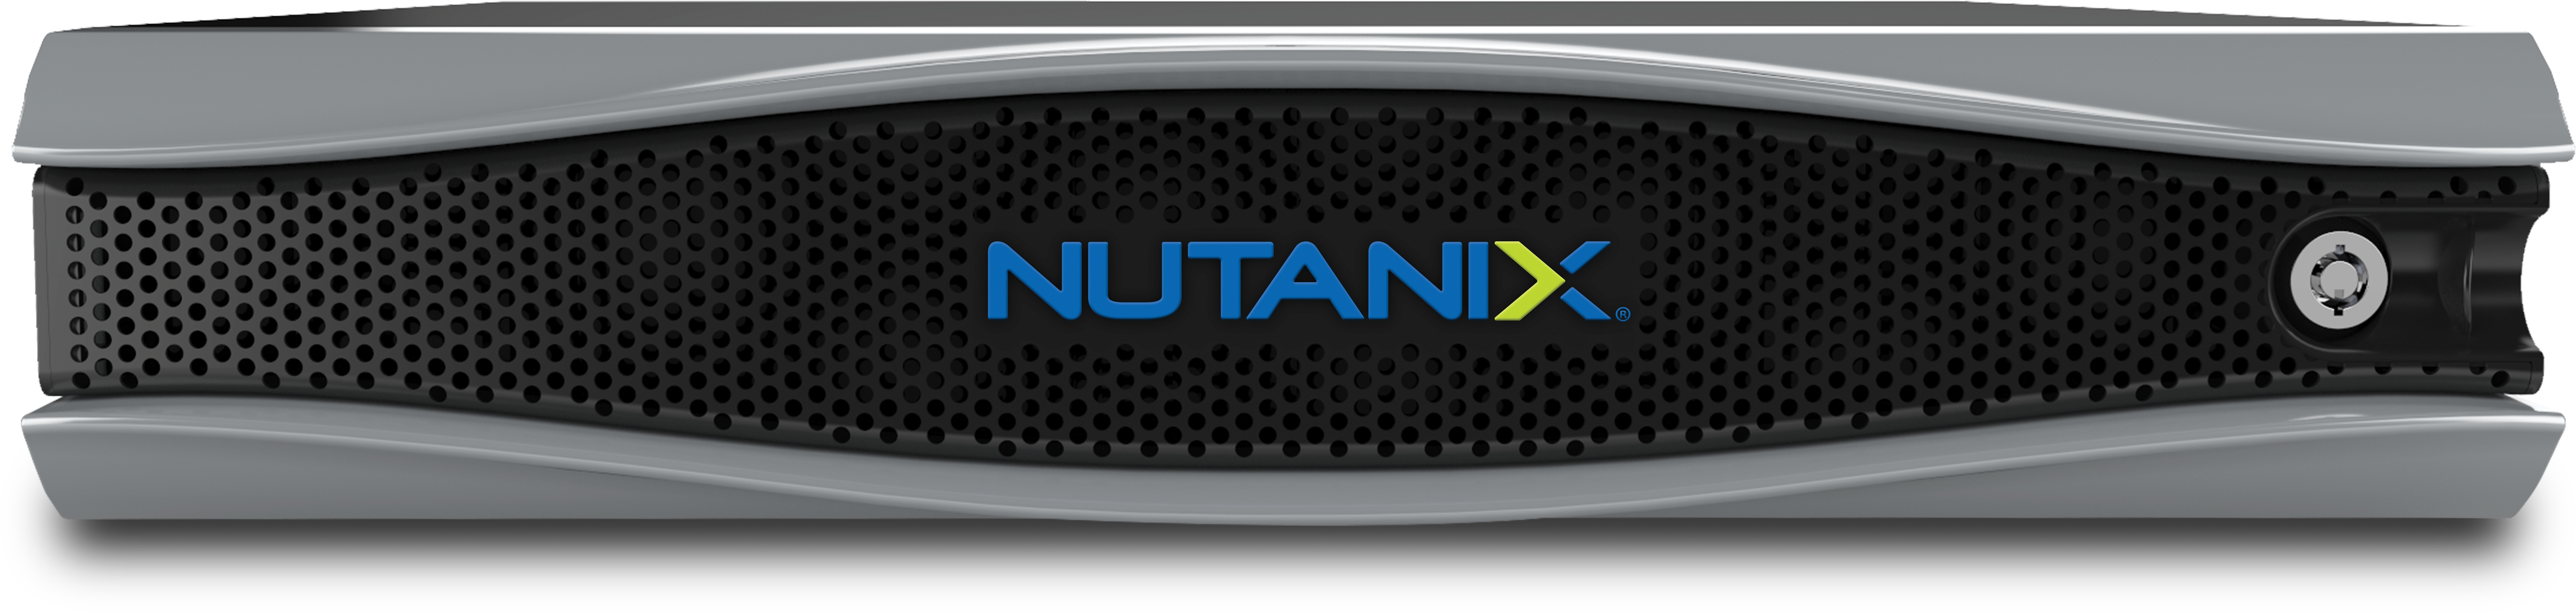 nutanix box